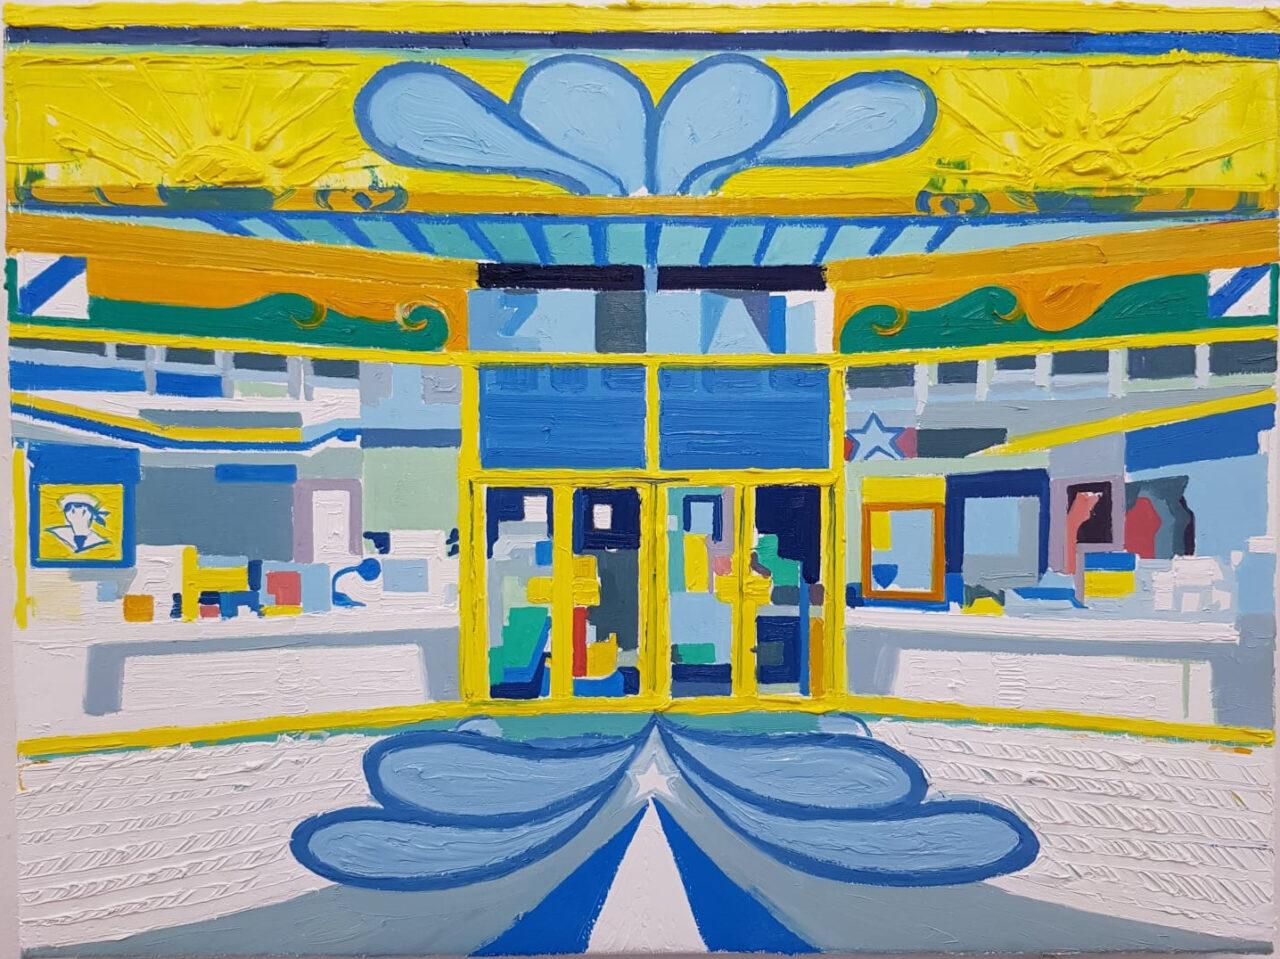 Shop Window (Zeeman filiaal) 2021. Oil on linen, 30x40cm